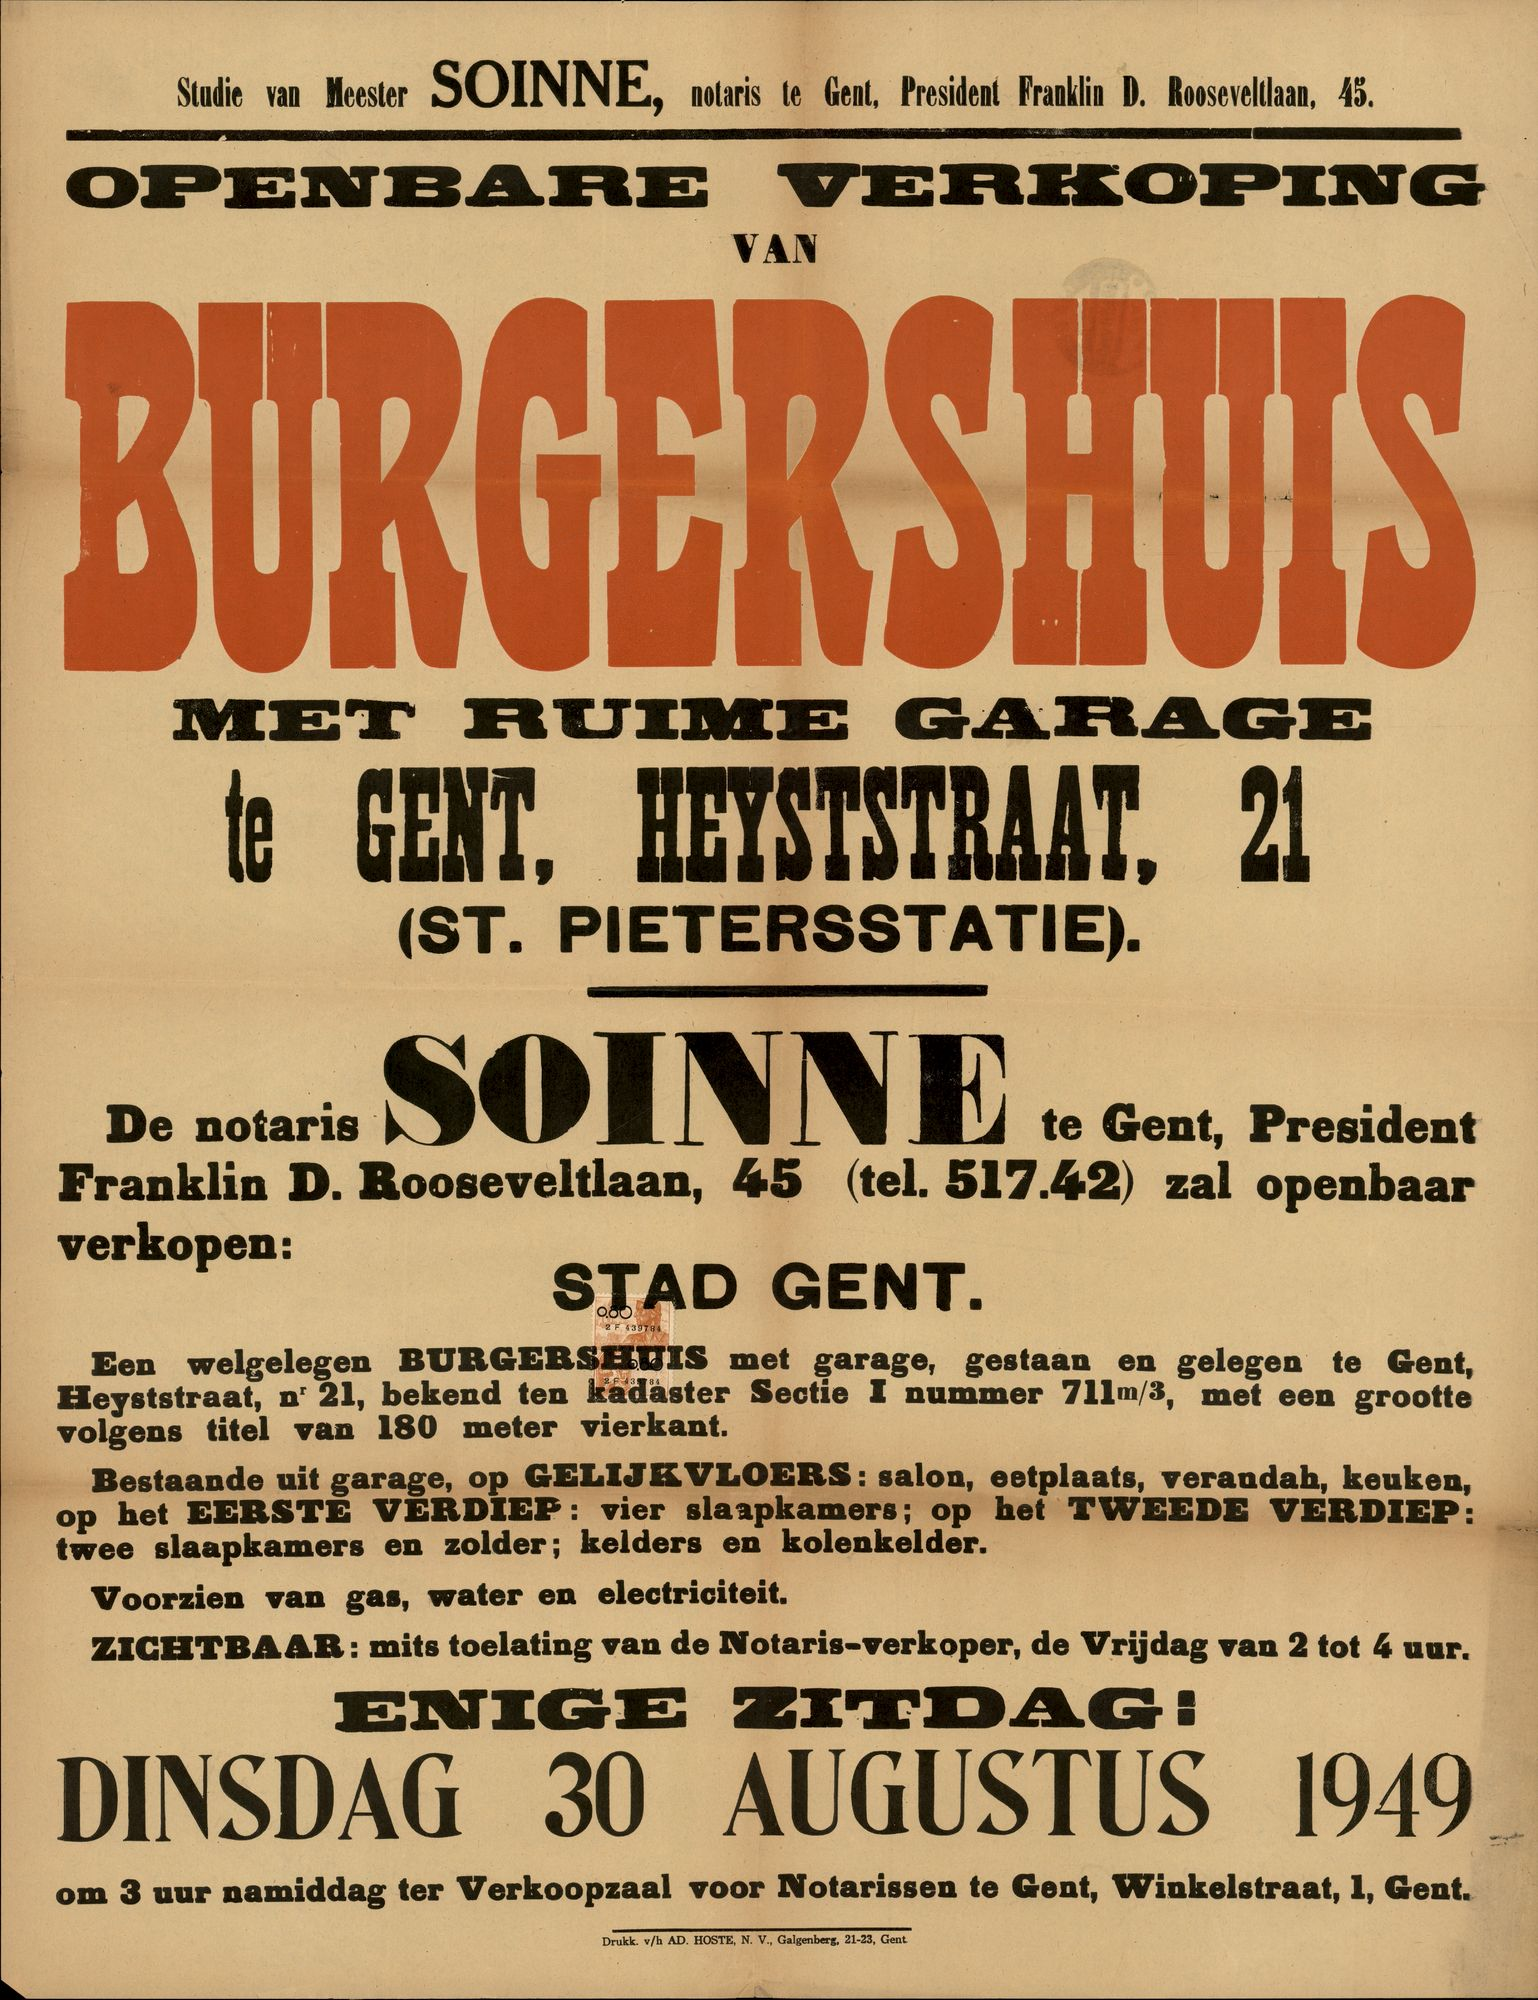 Openbare verkoop van burgershuis met ruime garage te Gent, Heyststraat, nr.21 (Heistraat) Gent, 30 augustus 1949